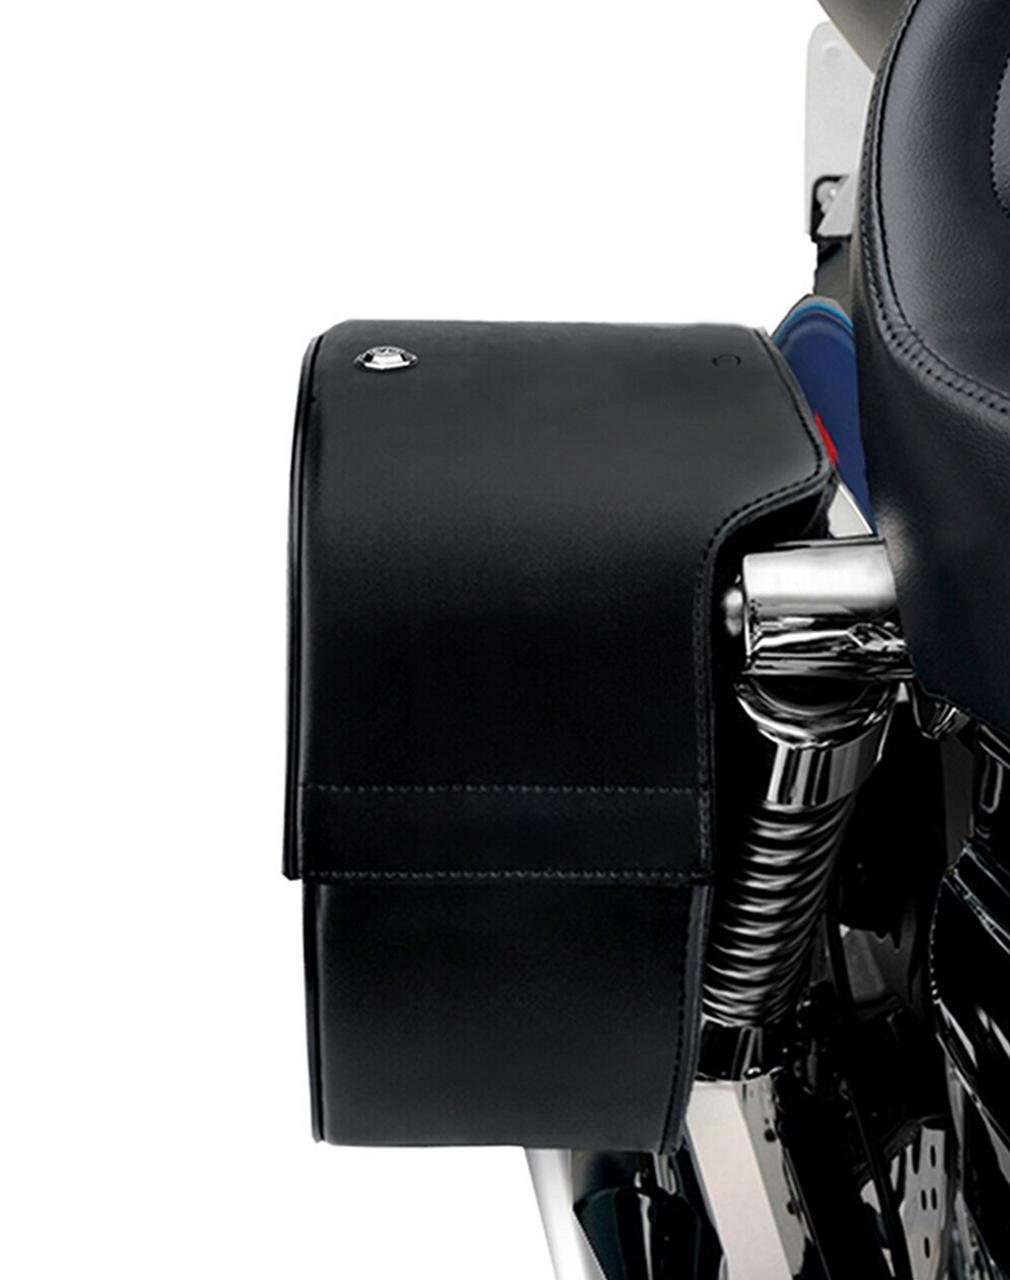 Viking Shock Cutout Large Slanted Saddlebags For Harley Sportster Iron 1200 Shock cutout view